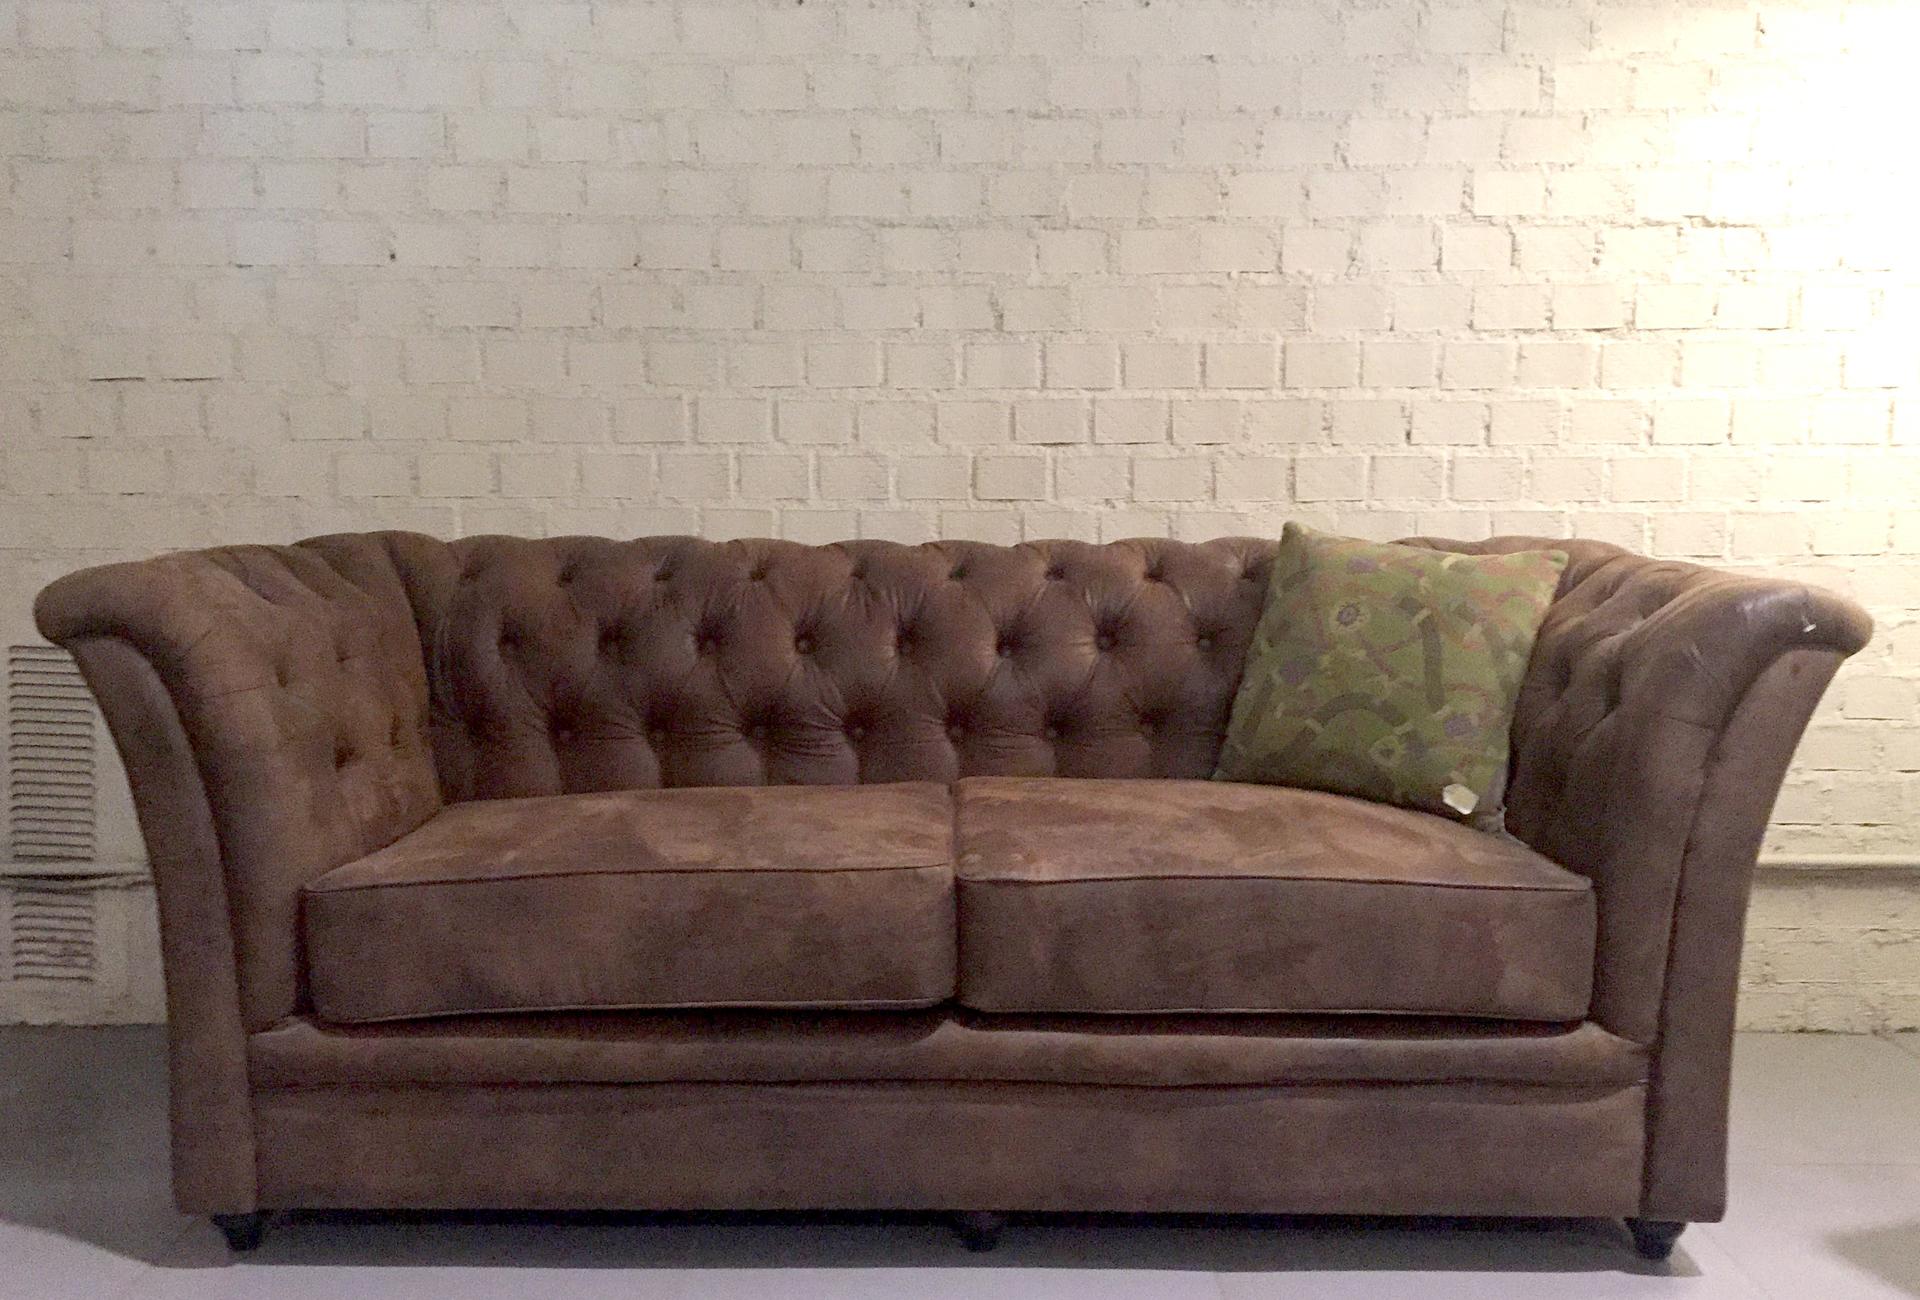 Tiendas de sofas en europolis vive muebles con estilo with tiendas de sofas en europolis - Sofas en europolis ...